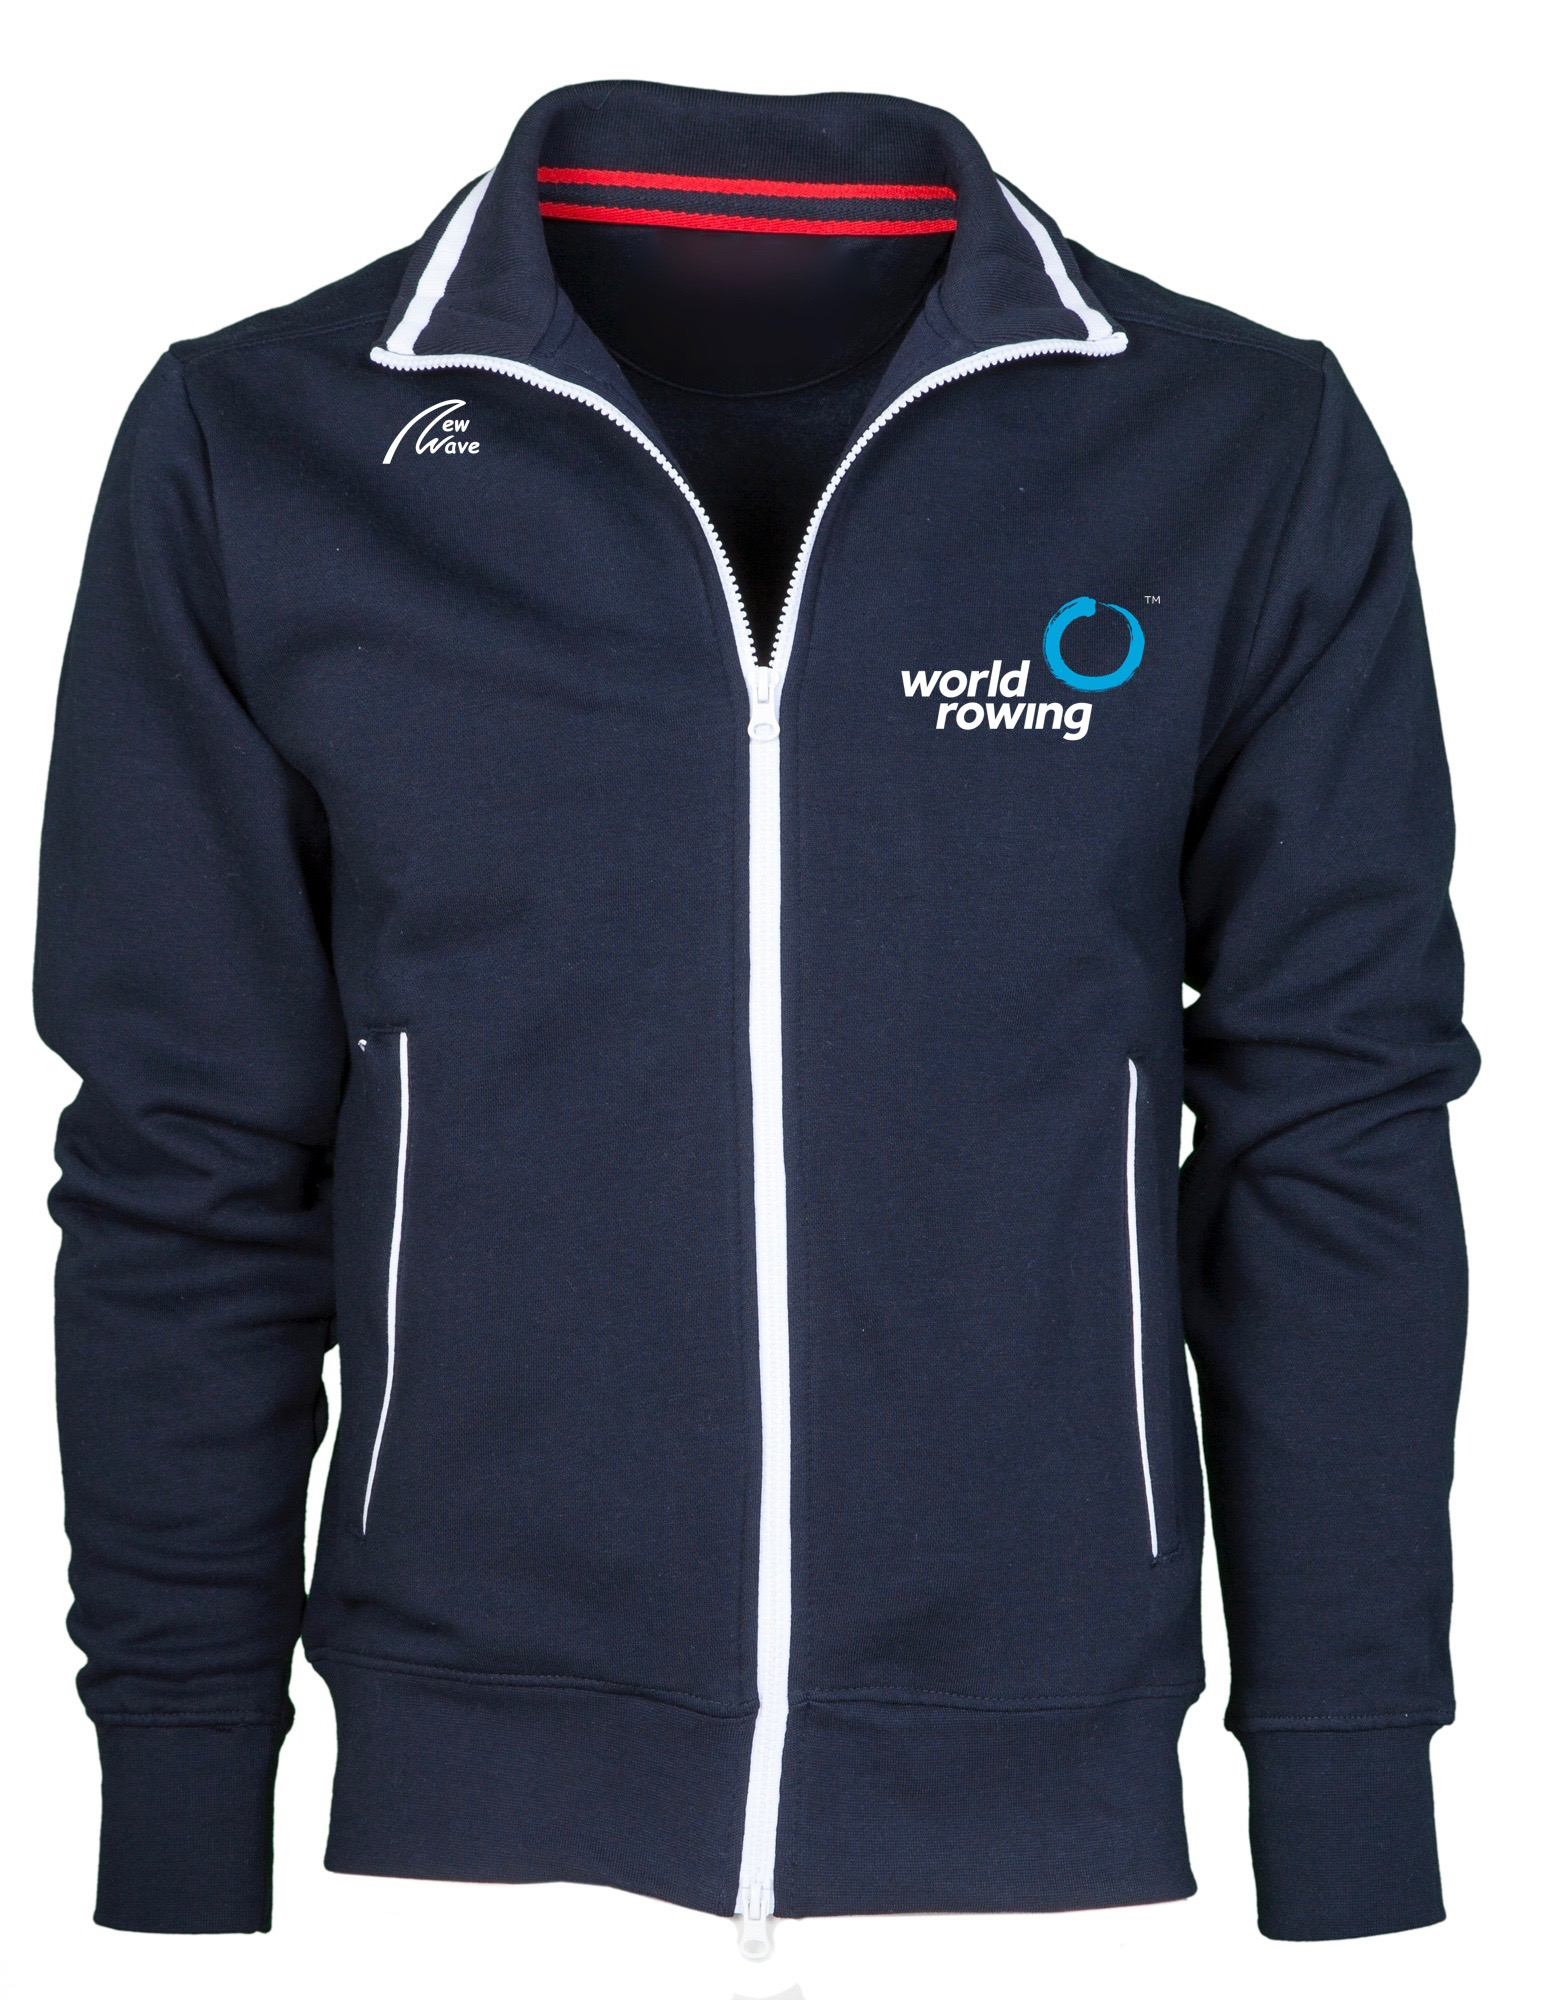 World Rowing Old School Jacket Man - Navy, NW Logo Brust oben rechts, WR Logo 8cm Brust lins, WR Logo 25cm Rücken